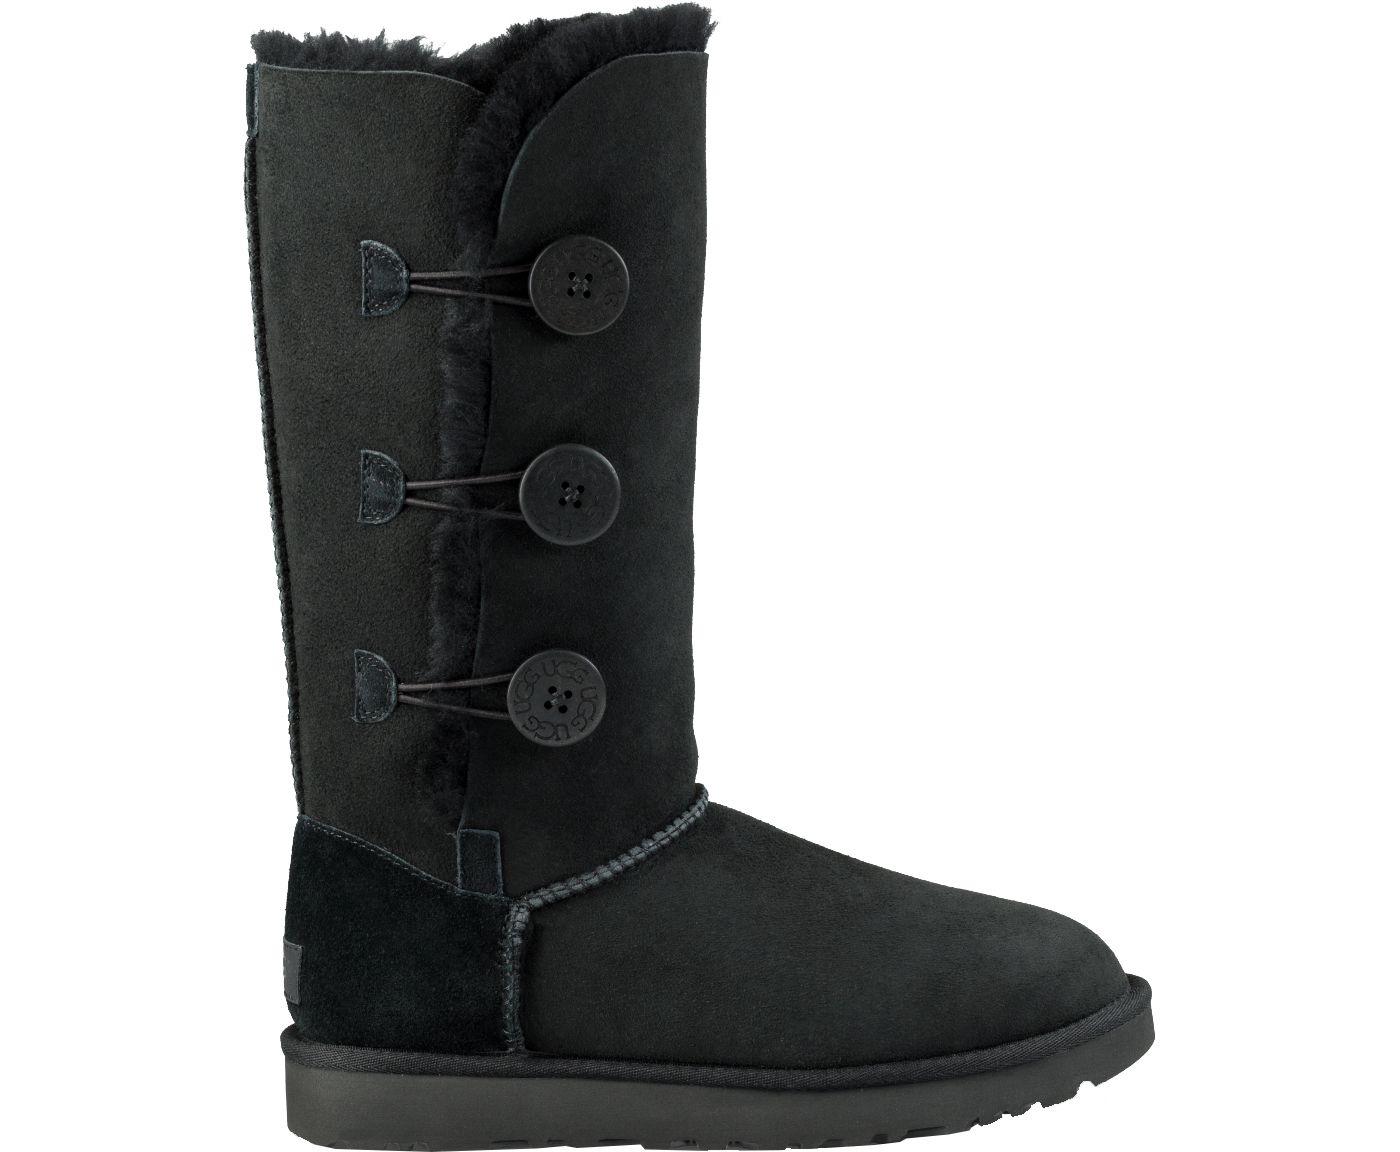 UGG Australia Women's Bailey Button Triplet II Winter Boots